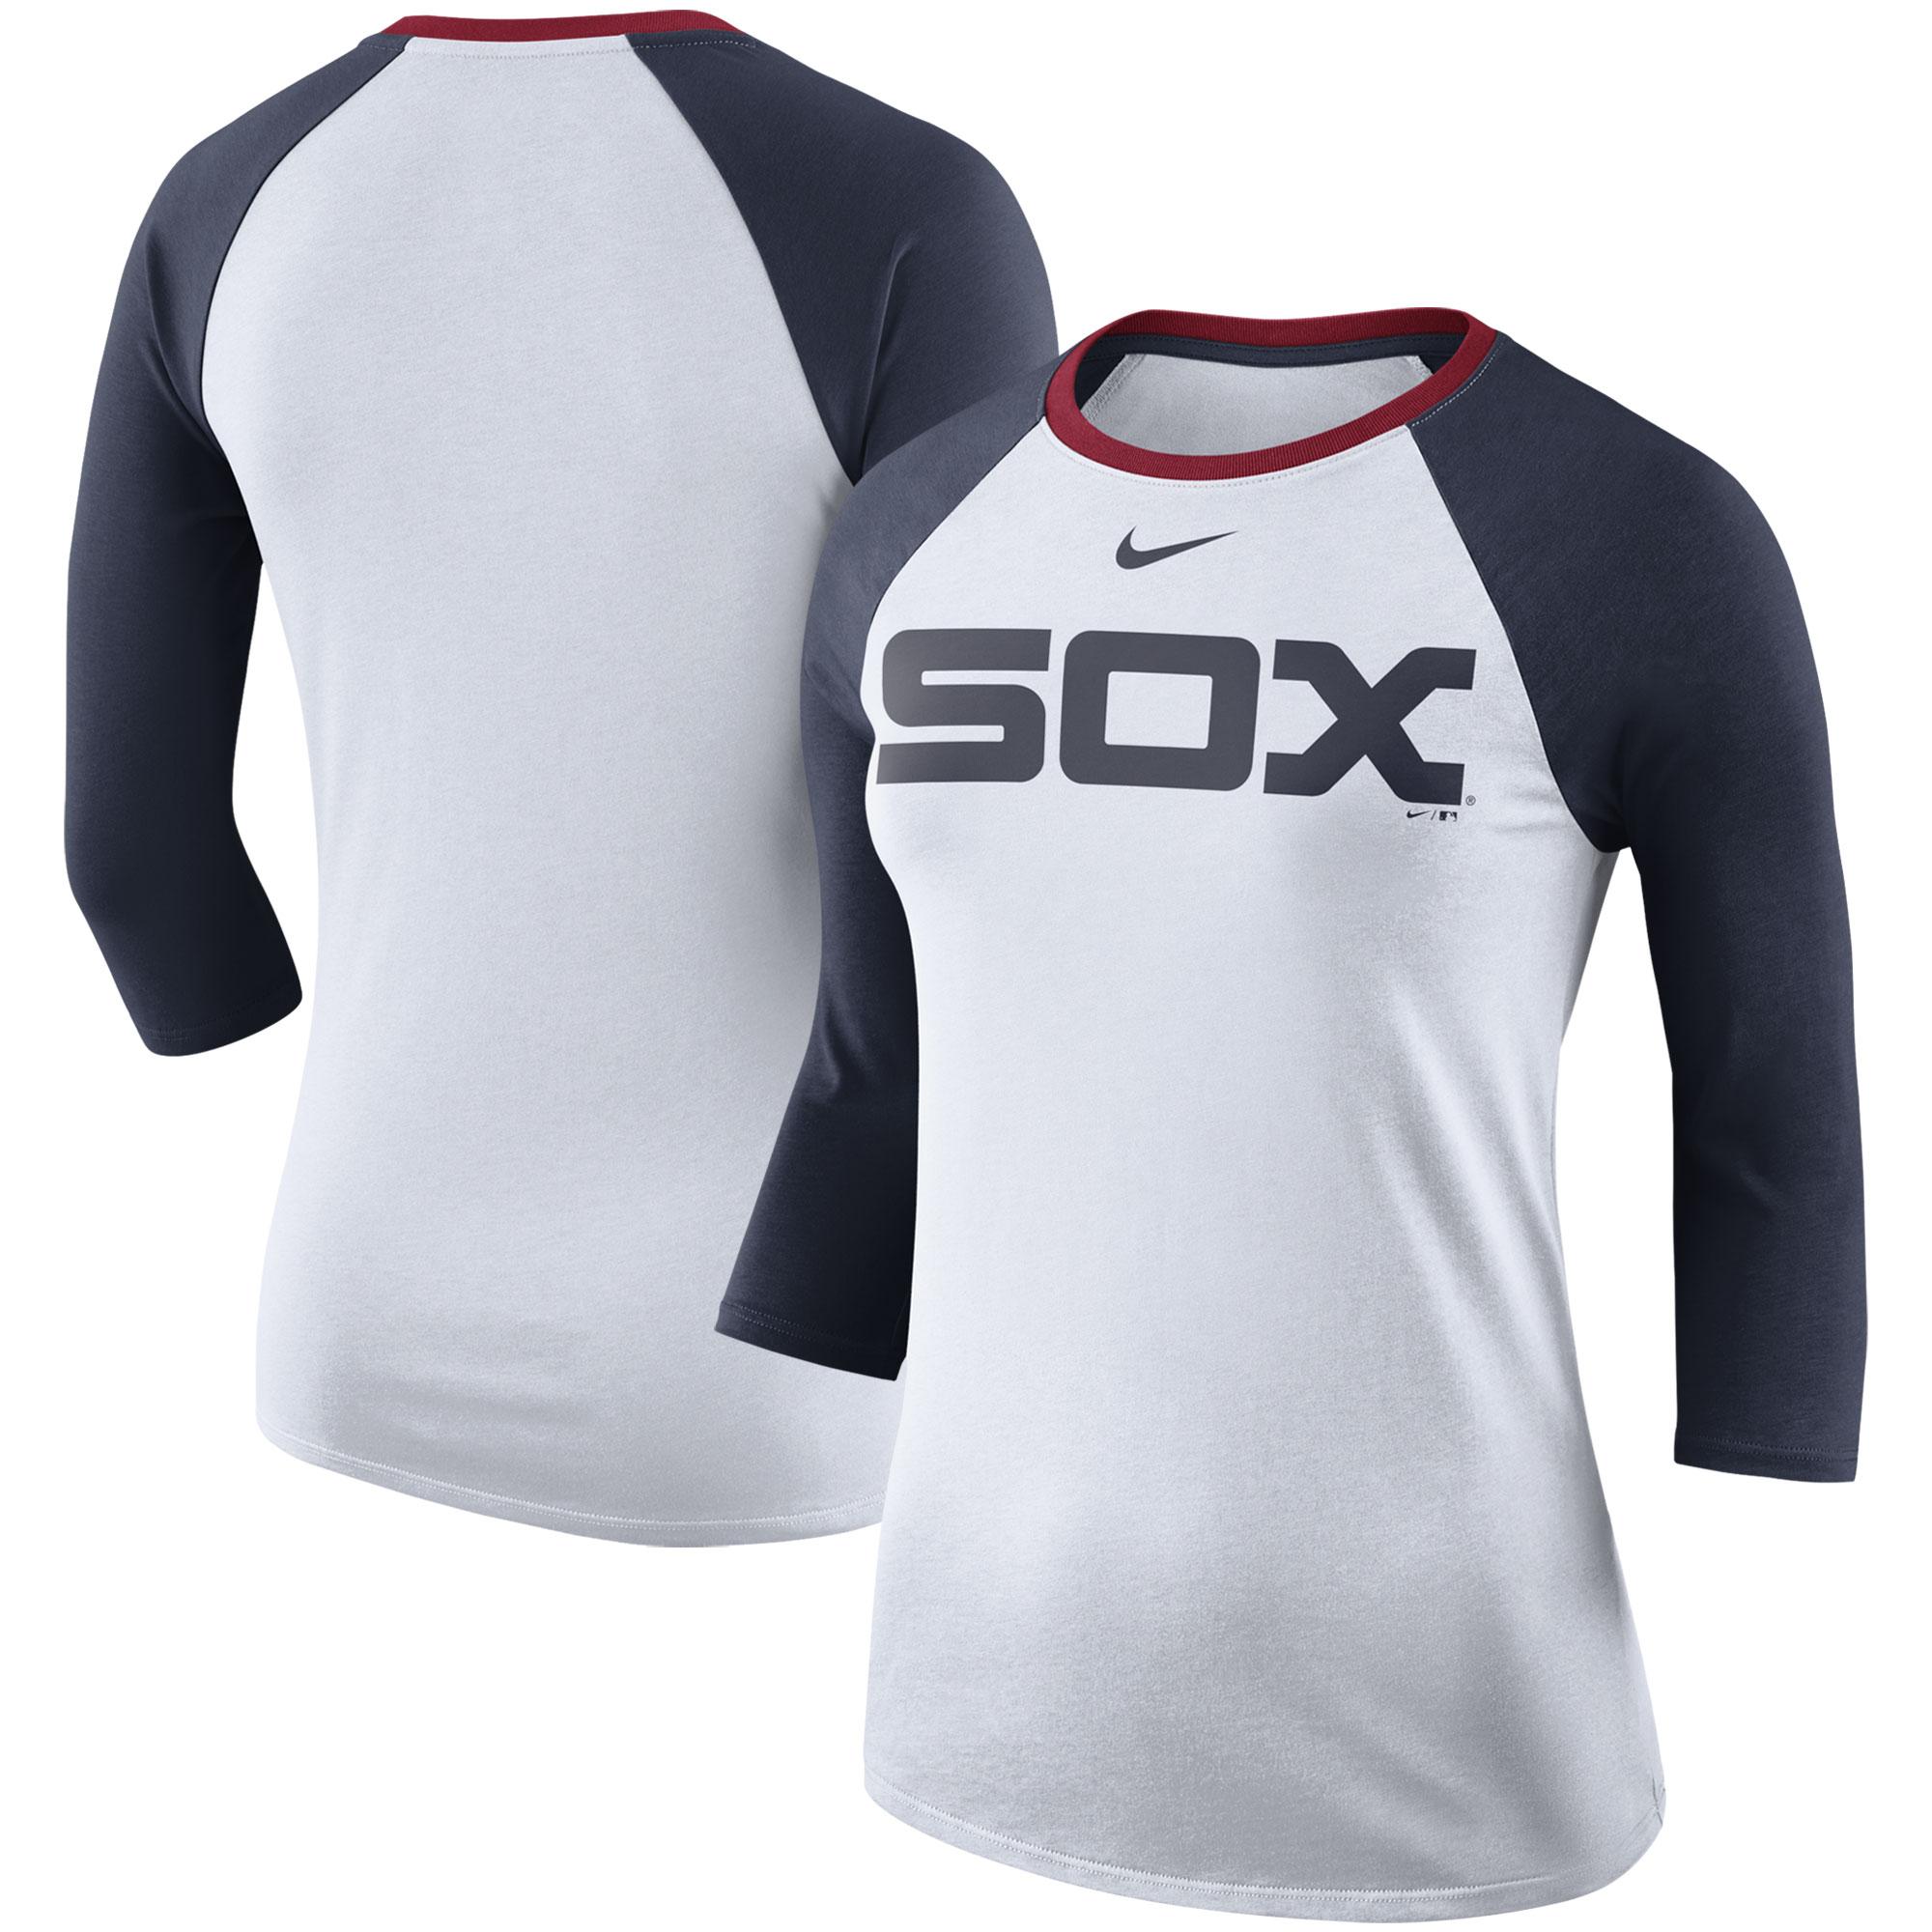 Chicago White Sox Nike Women's Tri-Blend Raglan 3/4-Sleeve T-Shirt - White/Navy